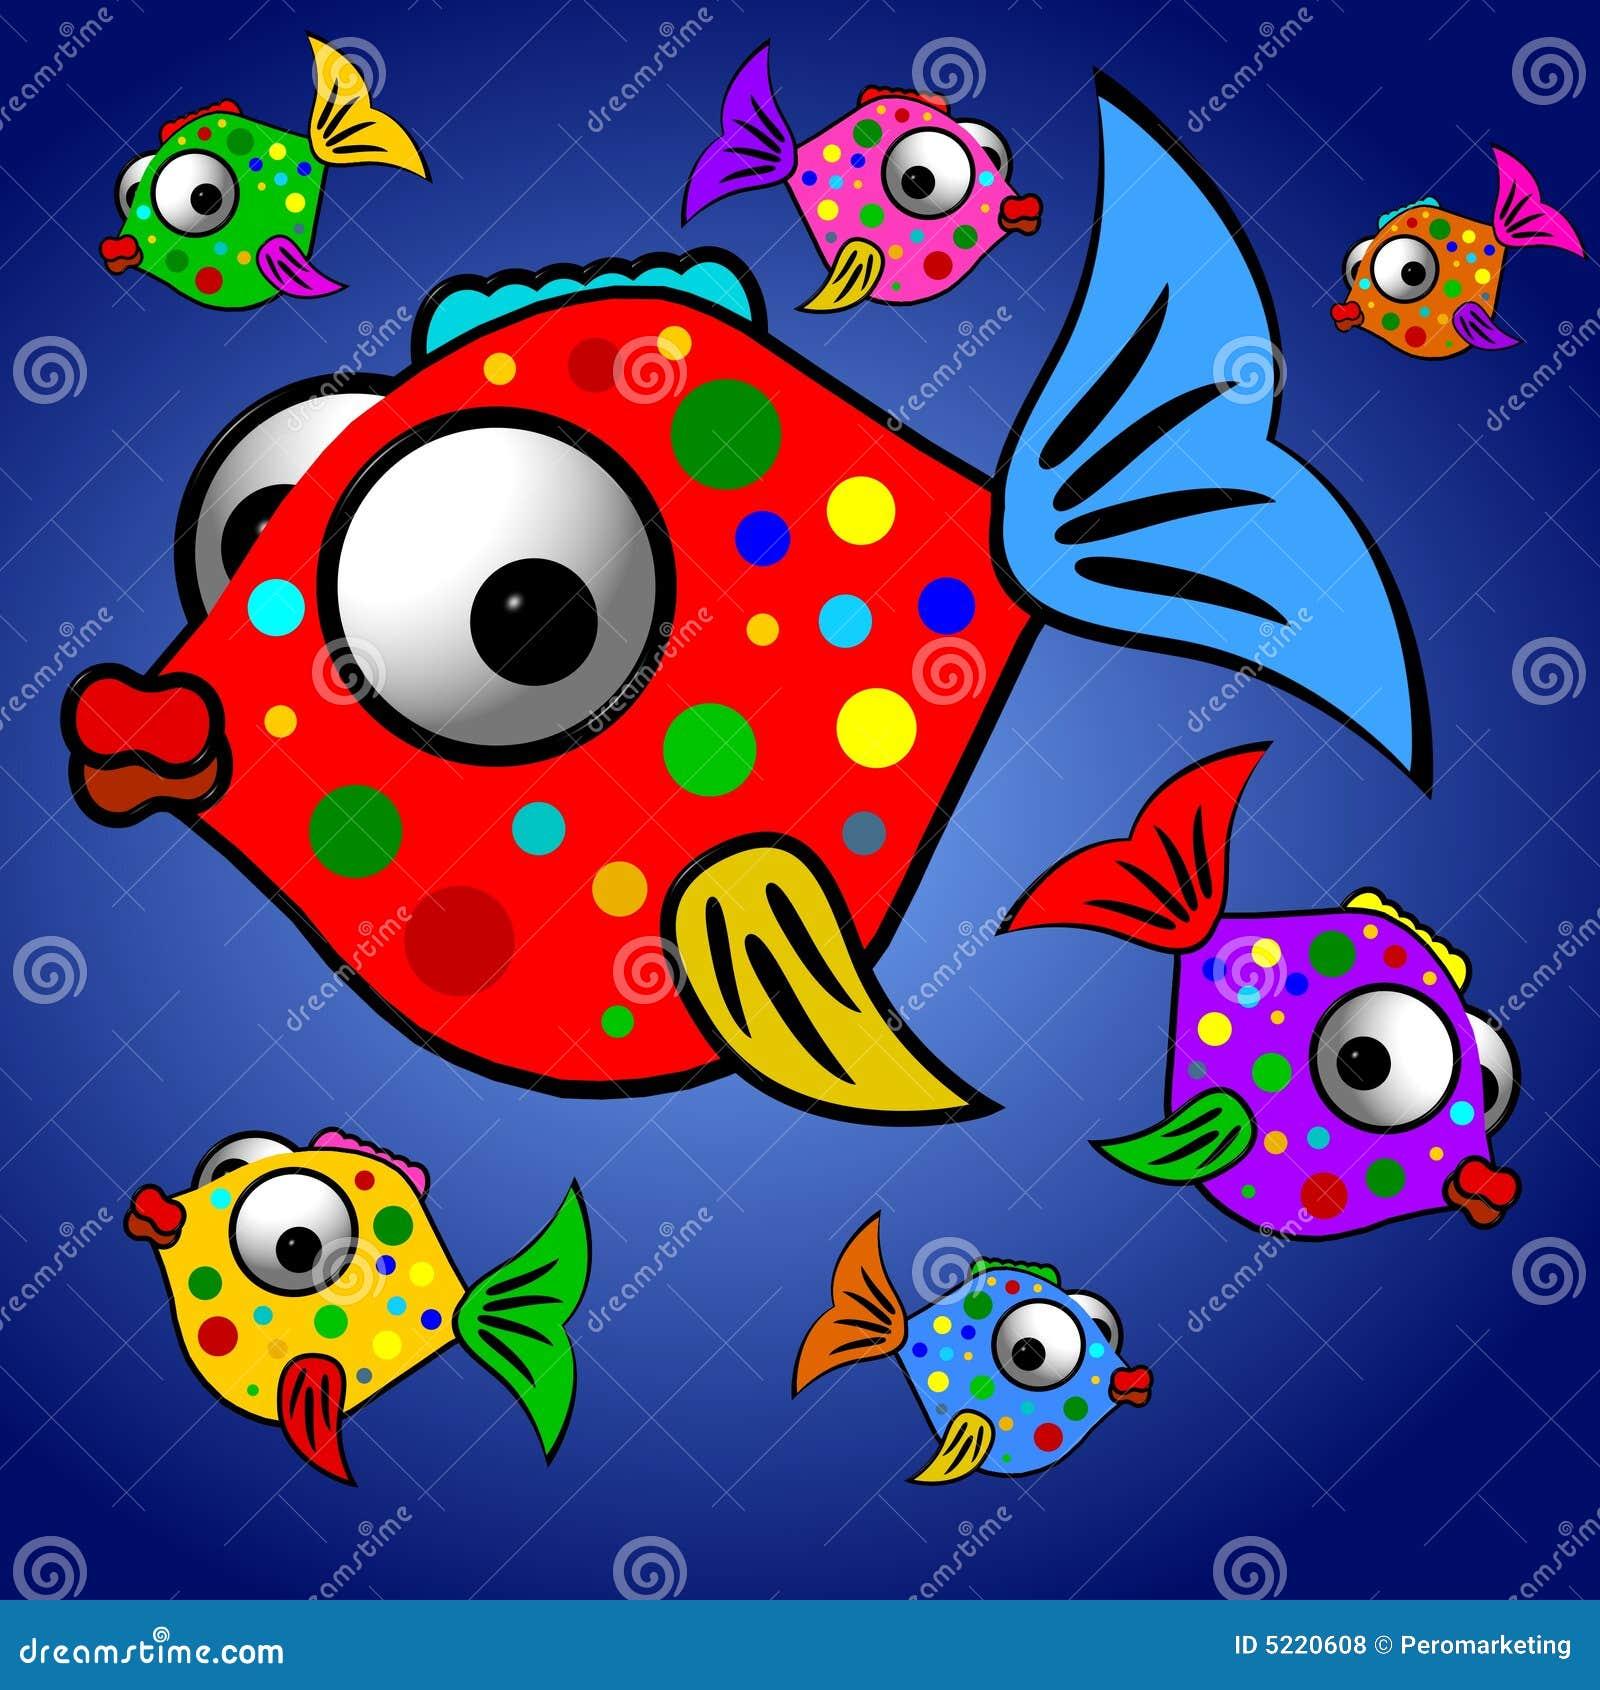 Colorful Fish Illustration stock illustration. Illustration of ...